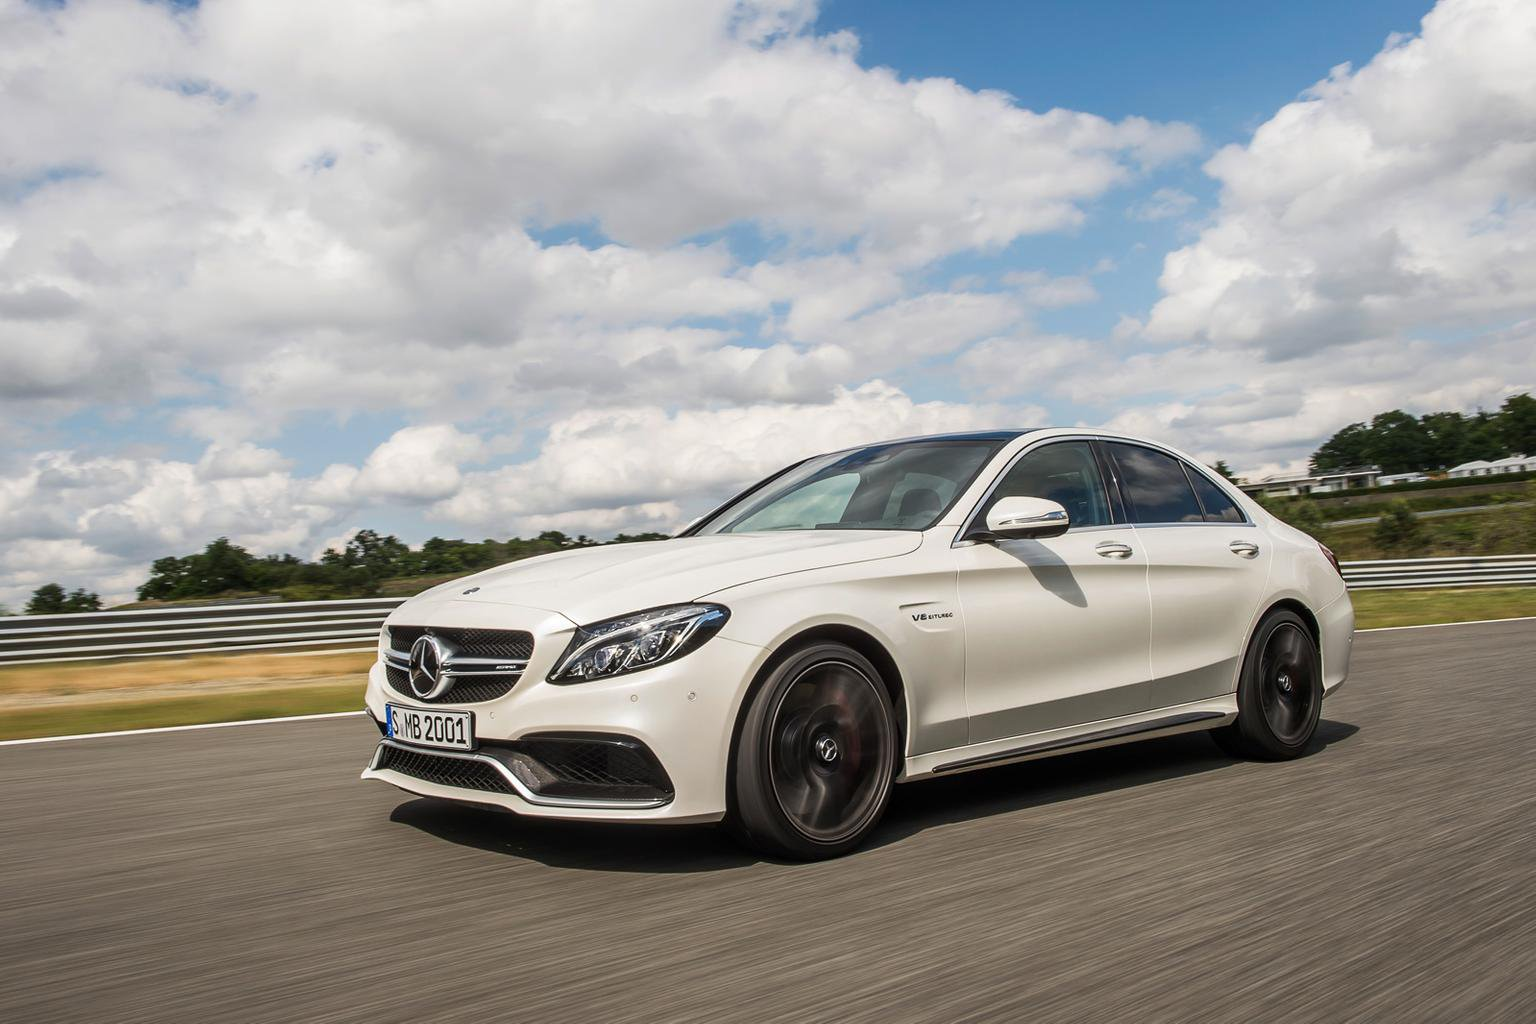 New Mercedes AMG C63 and C63 S revealed at Paris